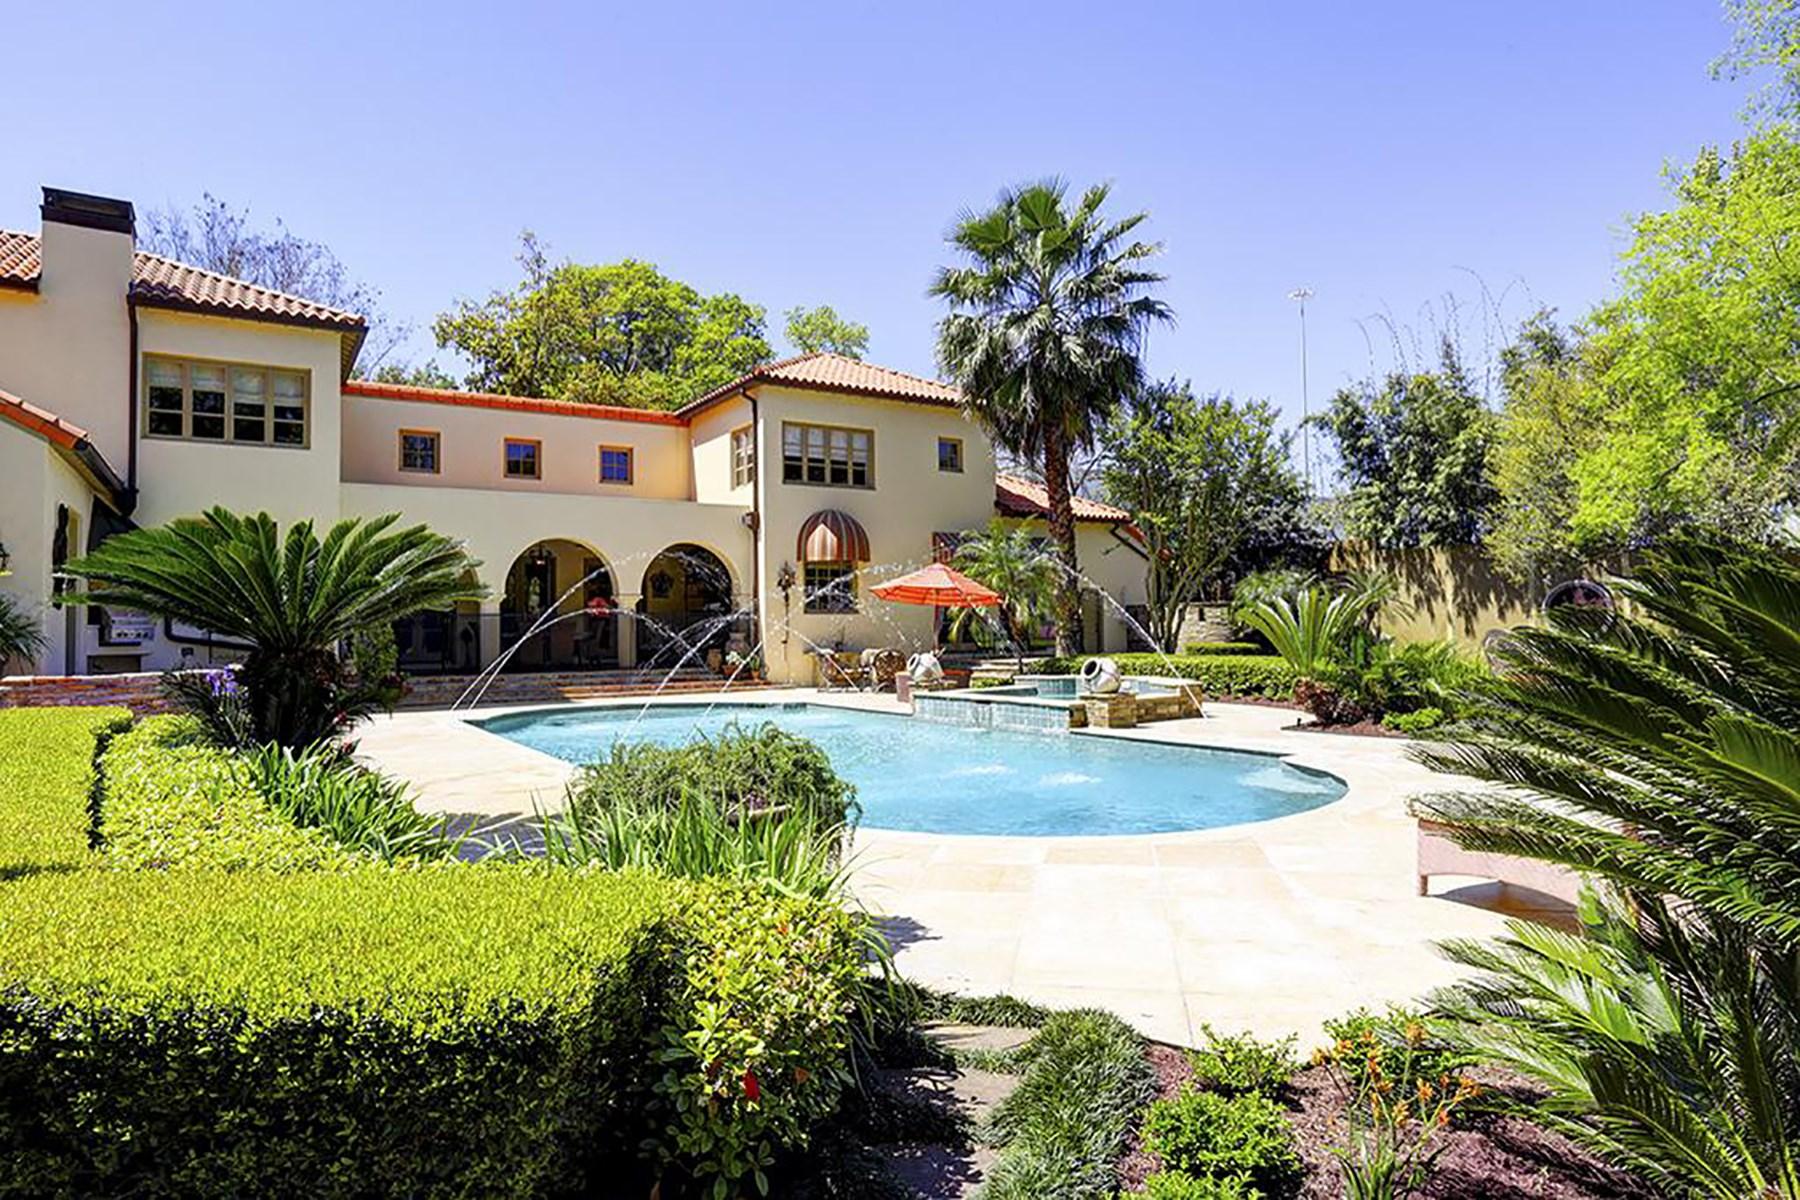 Single Family Home for Sale at 829 Little John Memorial, Houston, Texas 77024 United States